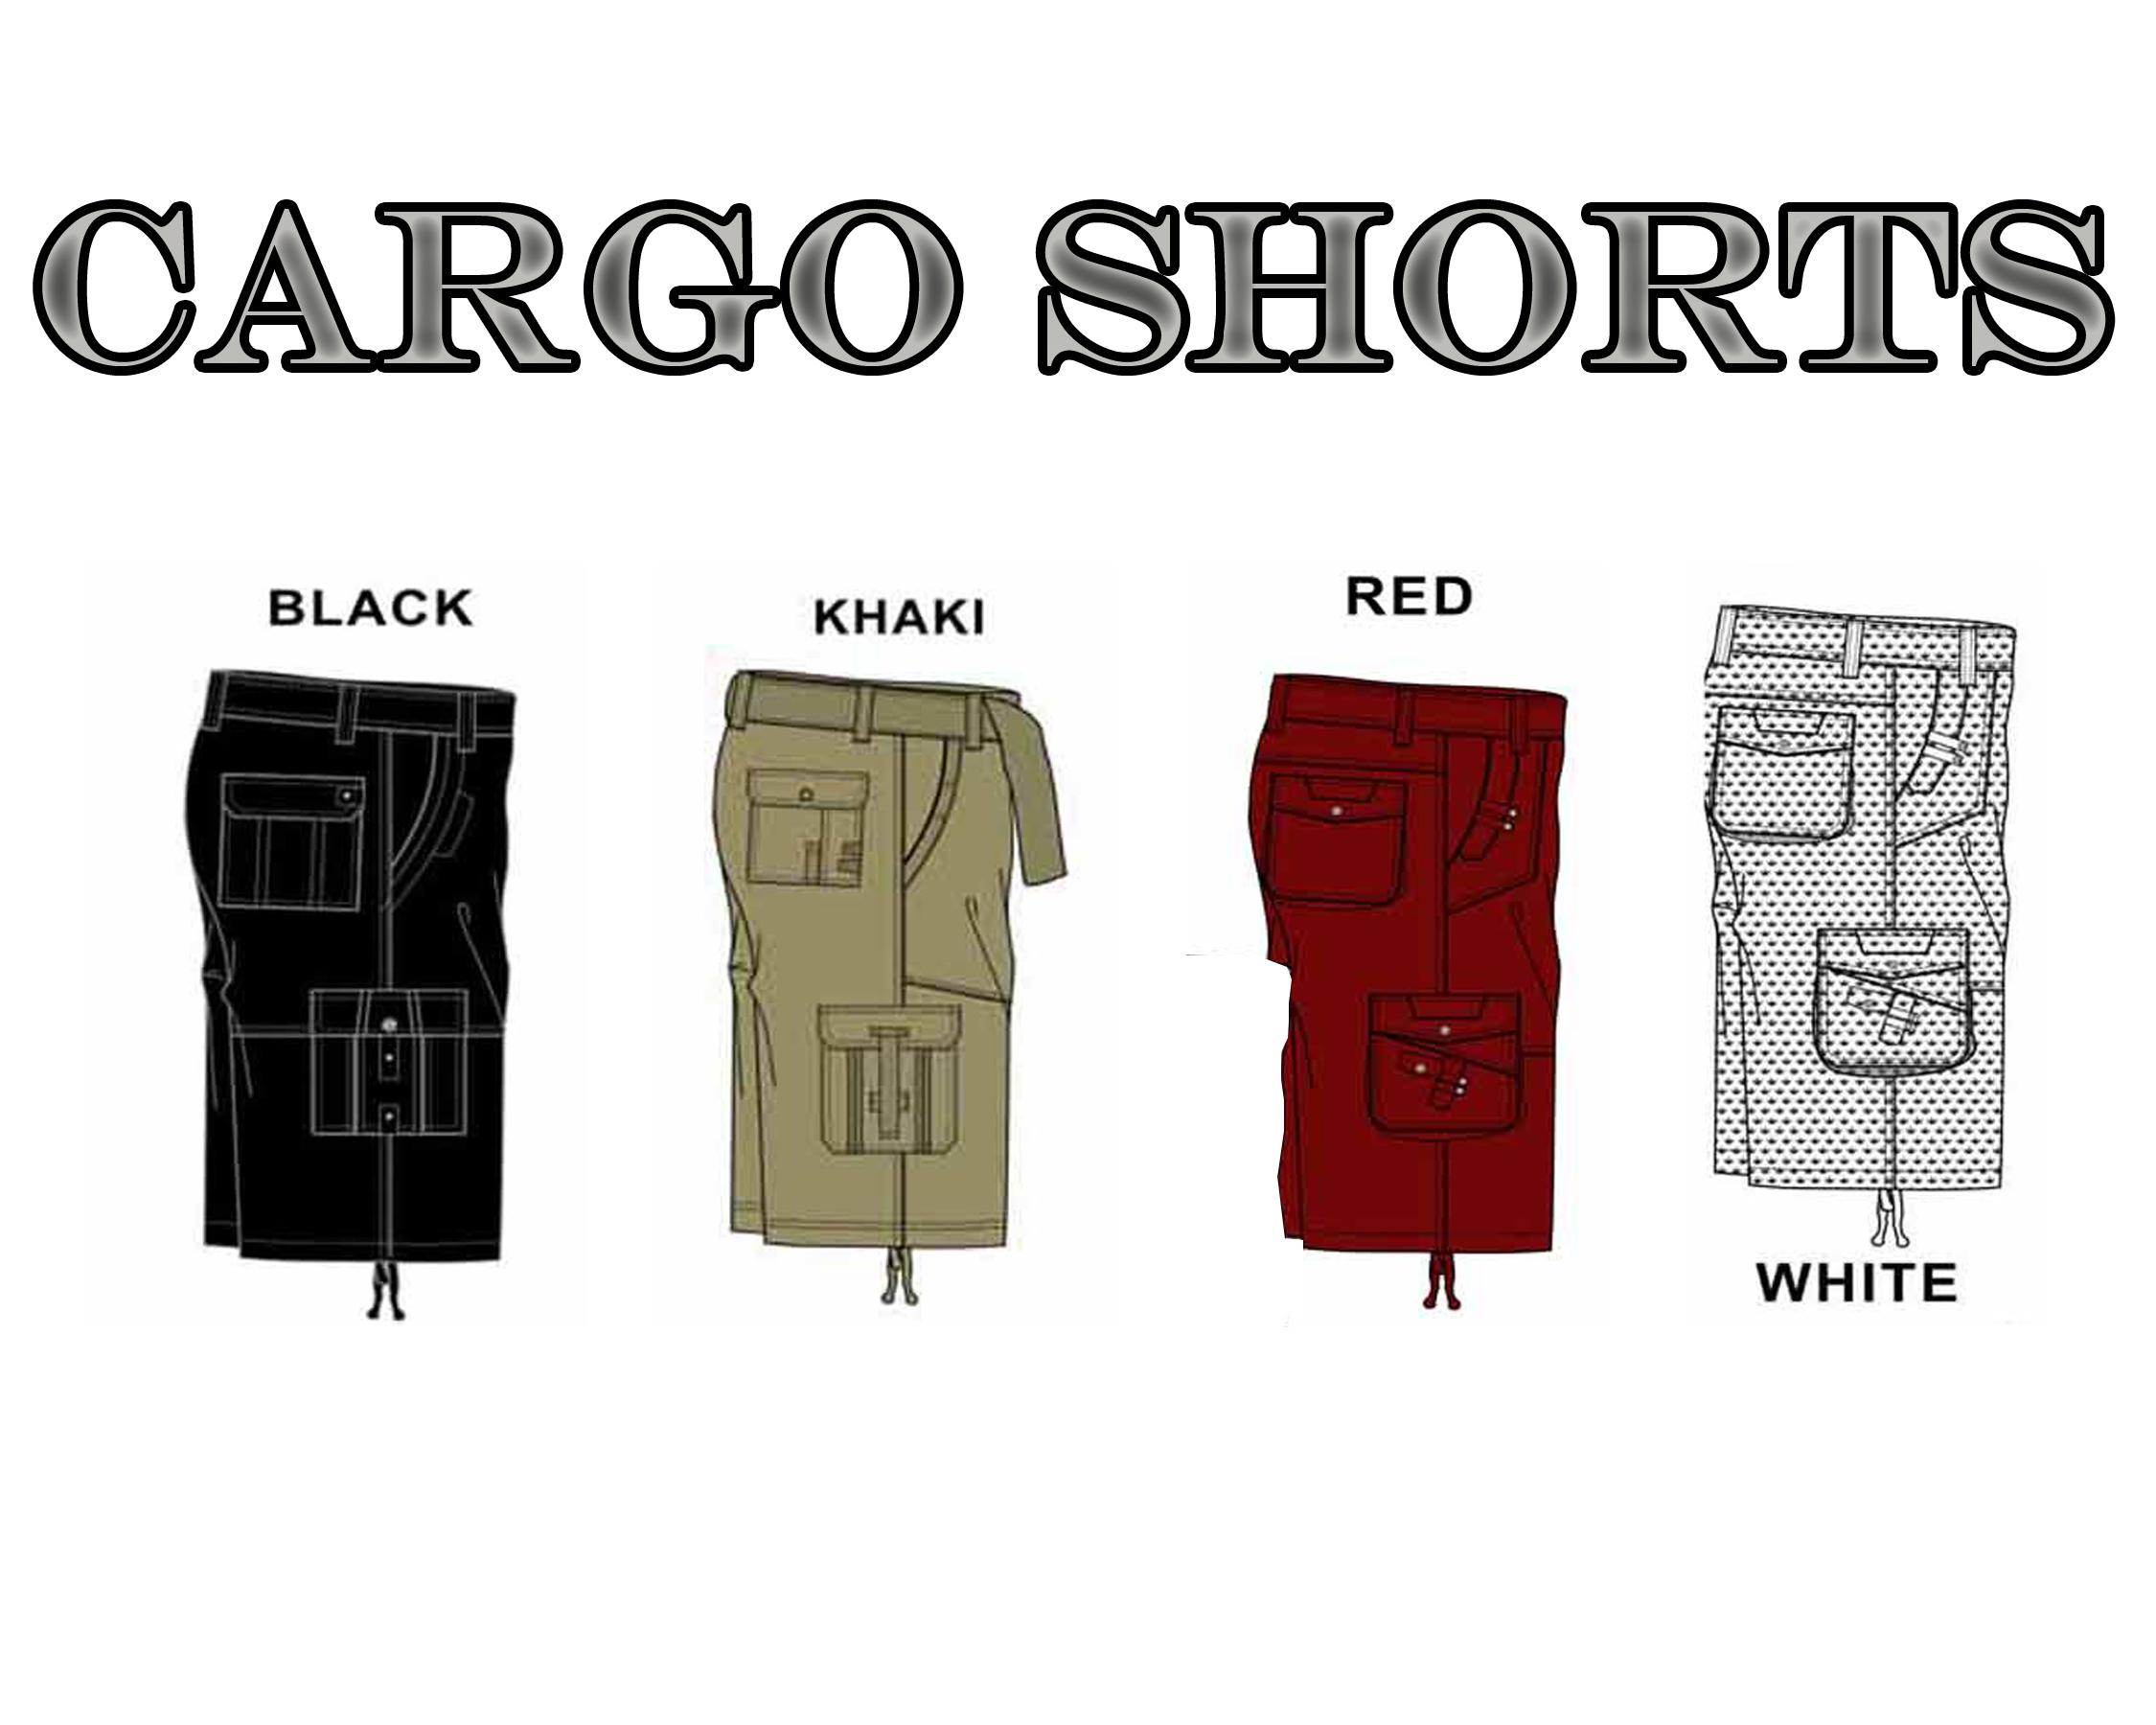 webpage-cargo-shorts-arrival-banner-box.jpg